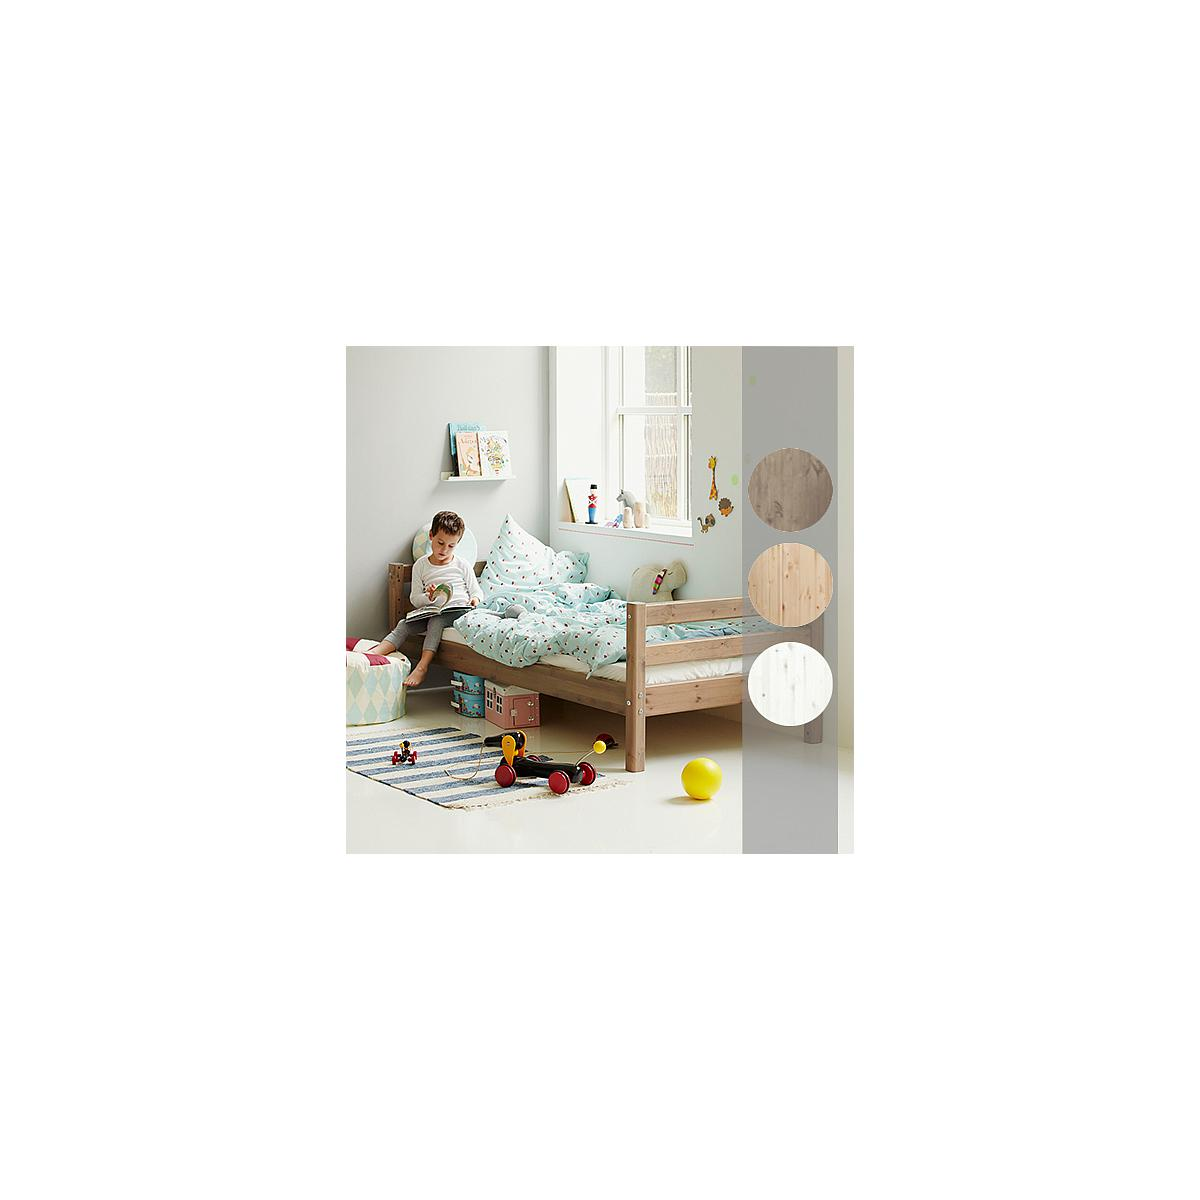 Cama somier 90x190 CLASSIC Flexa blanco cal